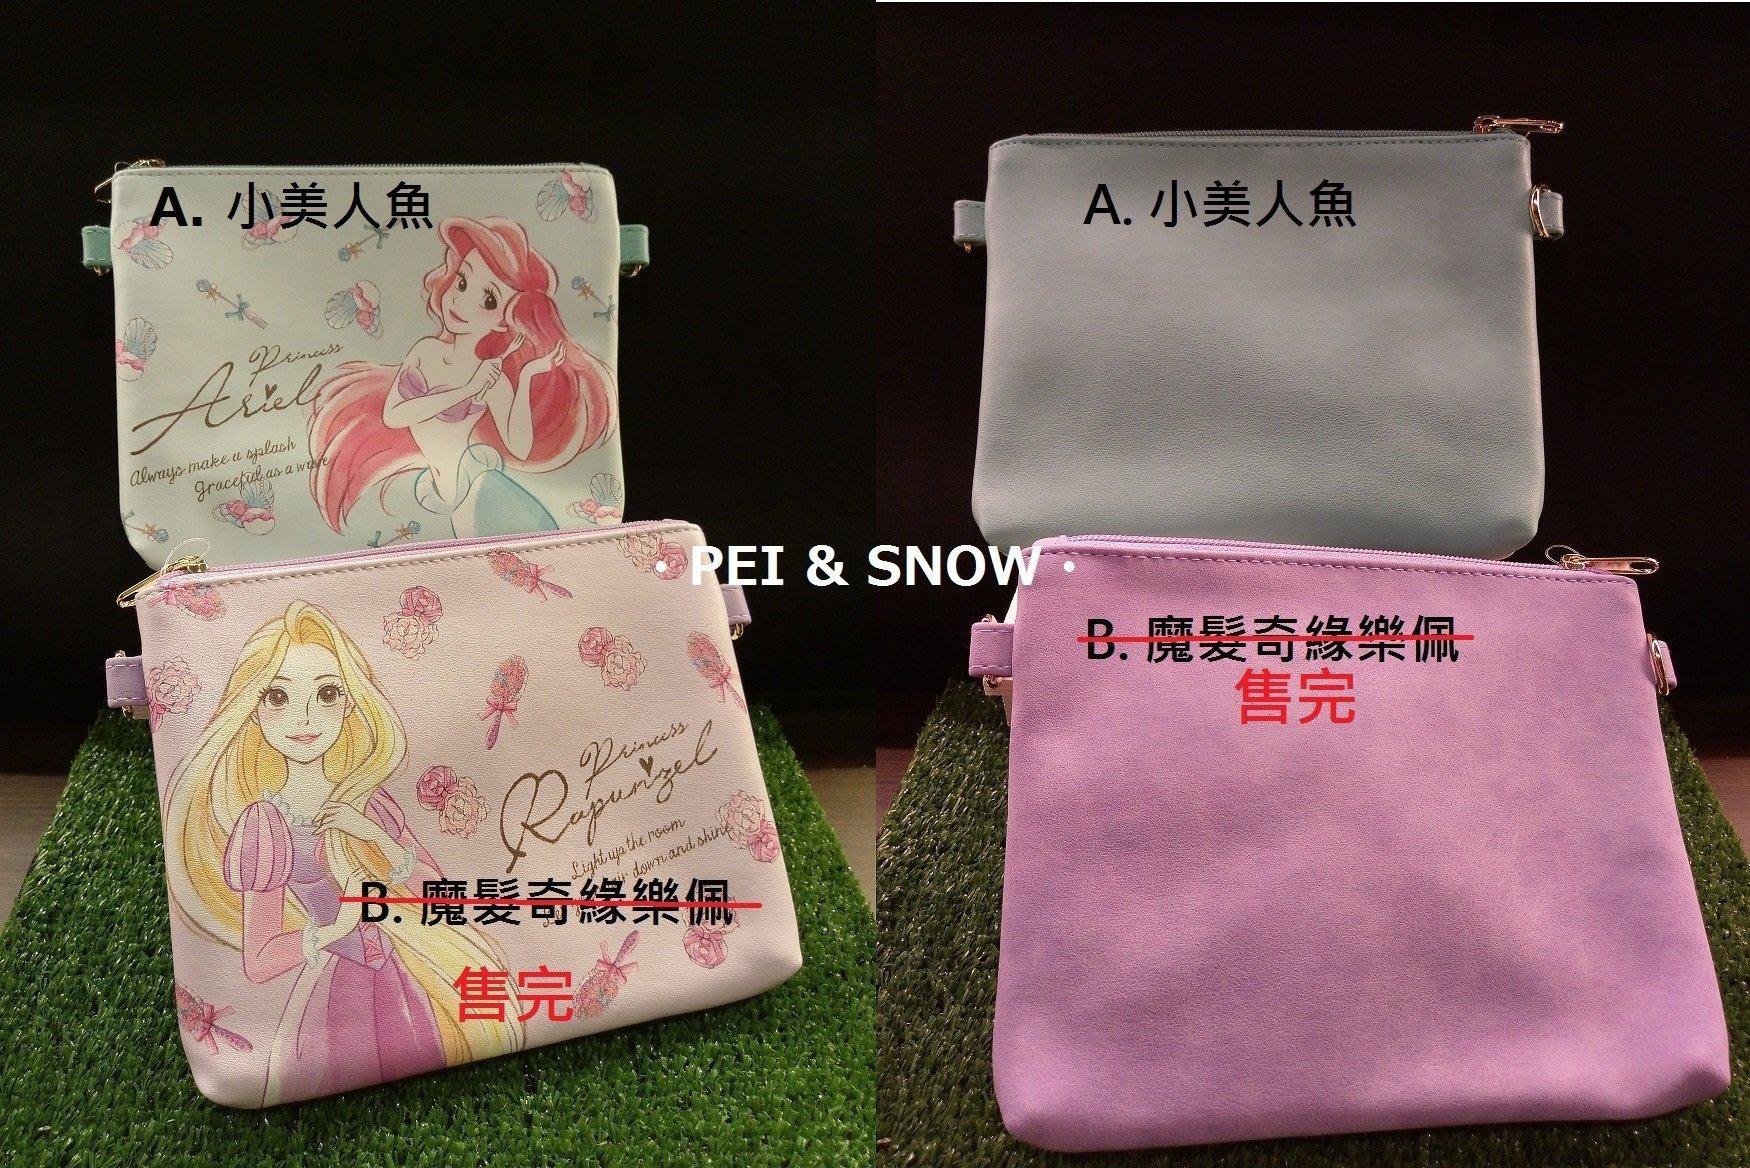 [ P & S ] 日本 東京 迪士尼 Disney 2017 小美人魚 樂佩 米妮 瑪麗貓 收納包 化妝包 手拿包